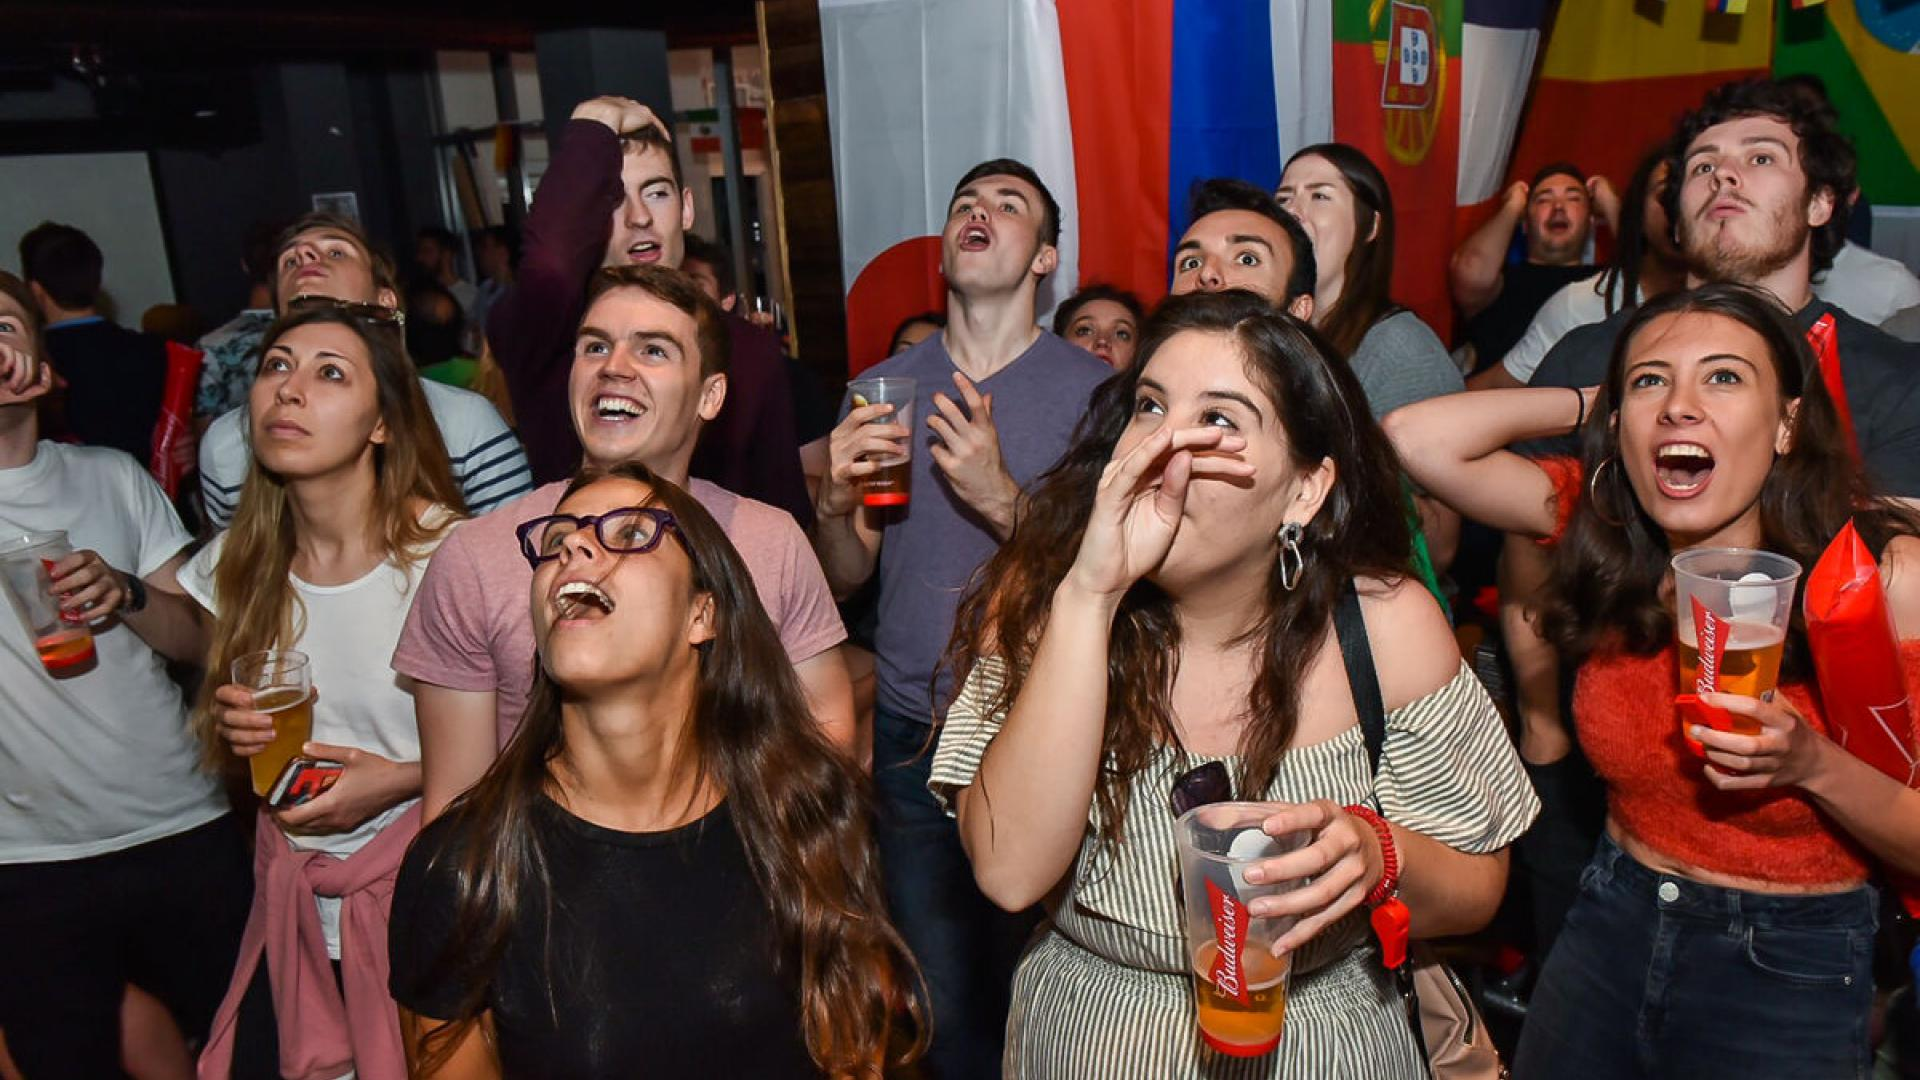 Fans celebrate at Belushi's sports bar